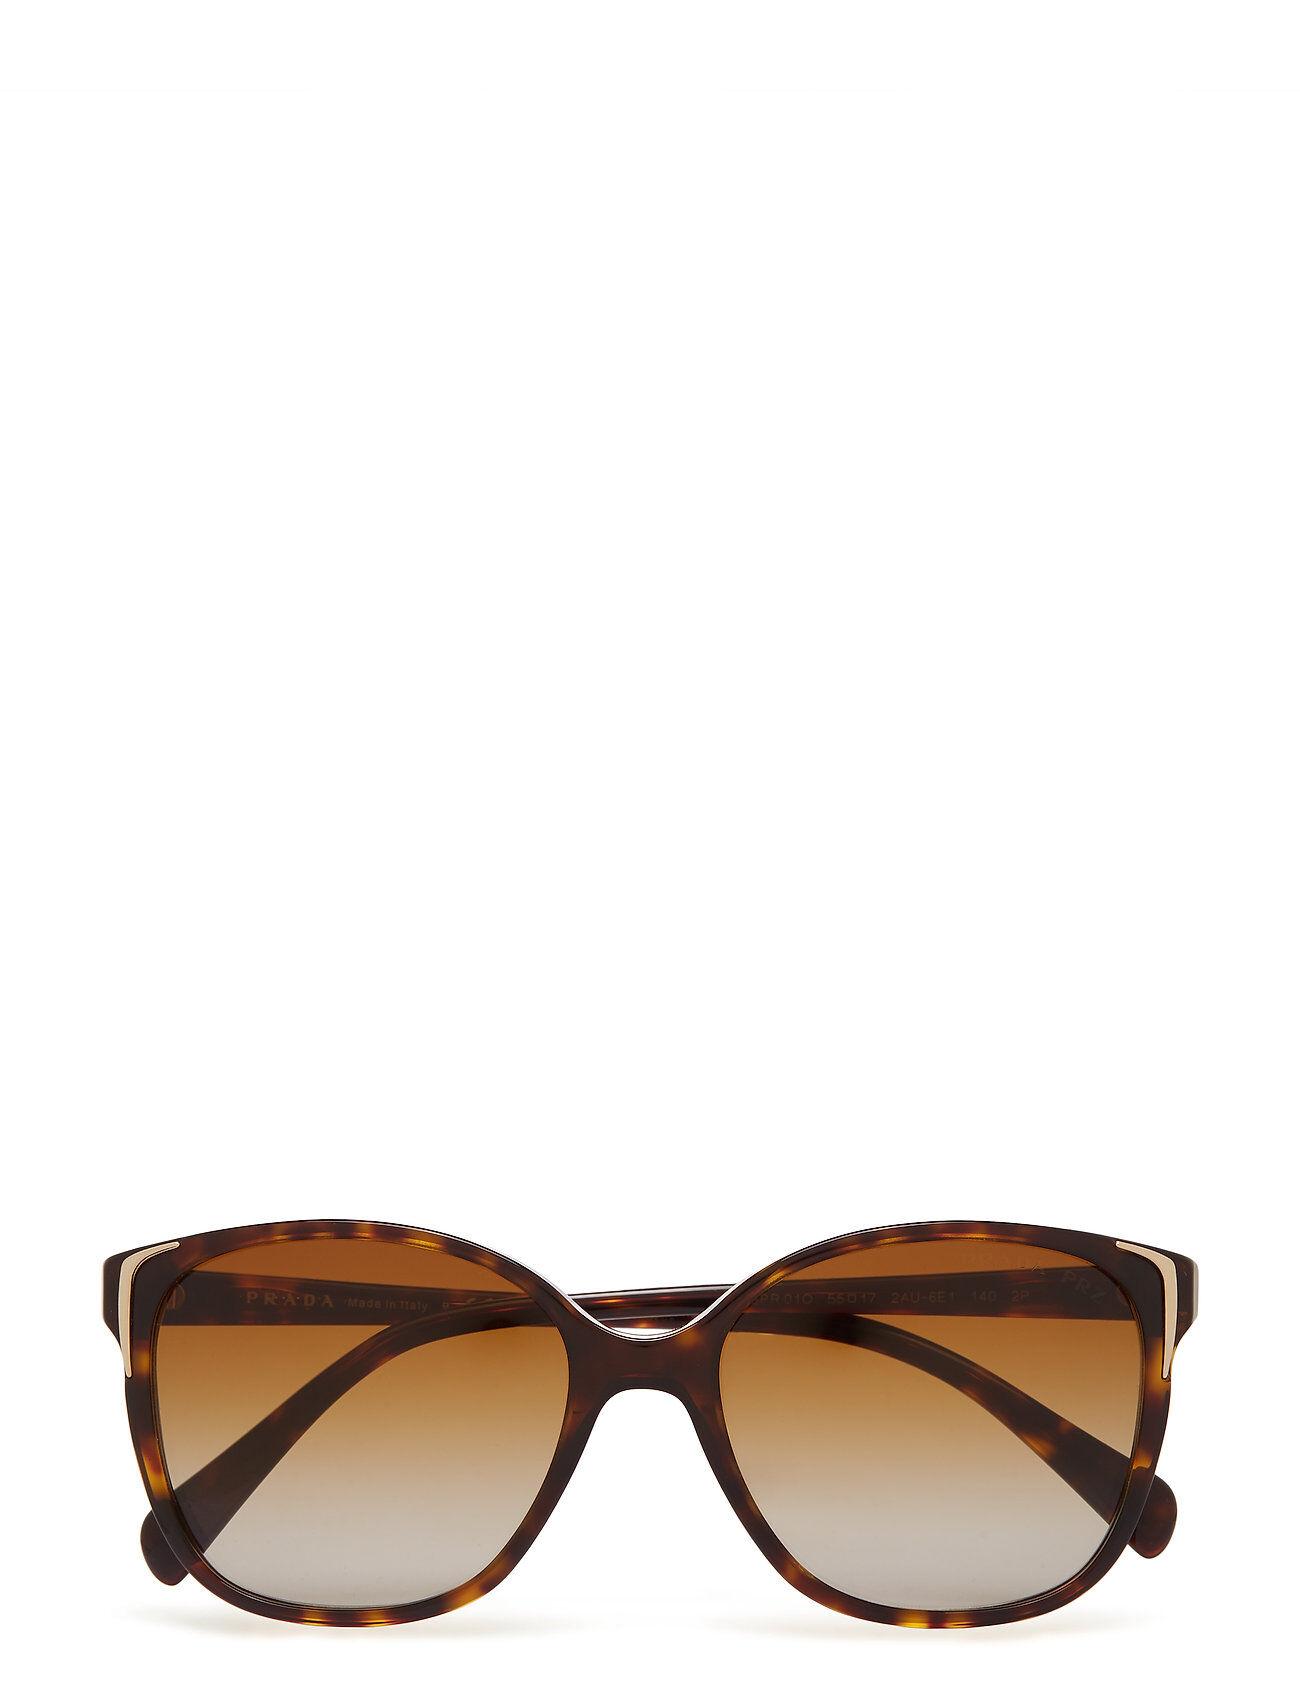 Image of Prada Sunglasses 0pr 01os Wayfarer Aurinkolasit Ruskea